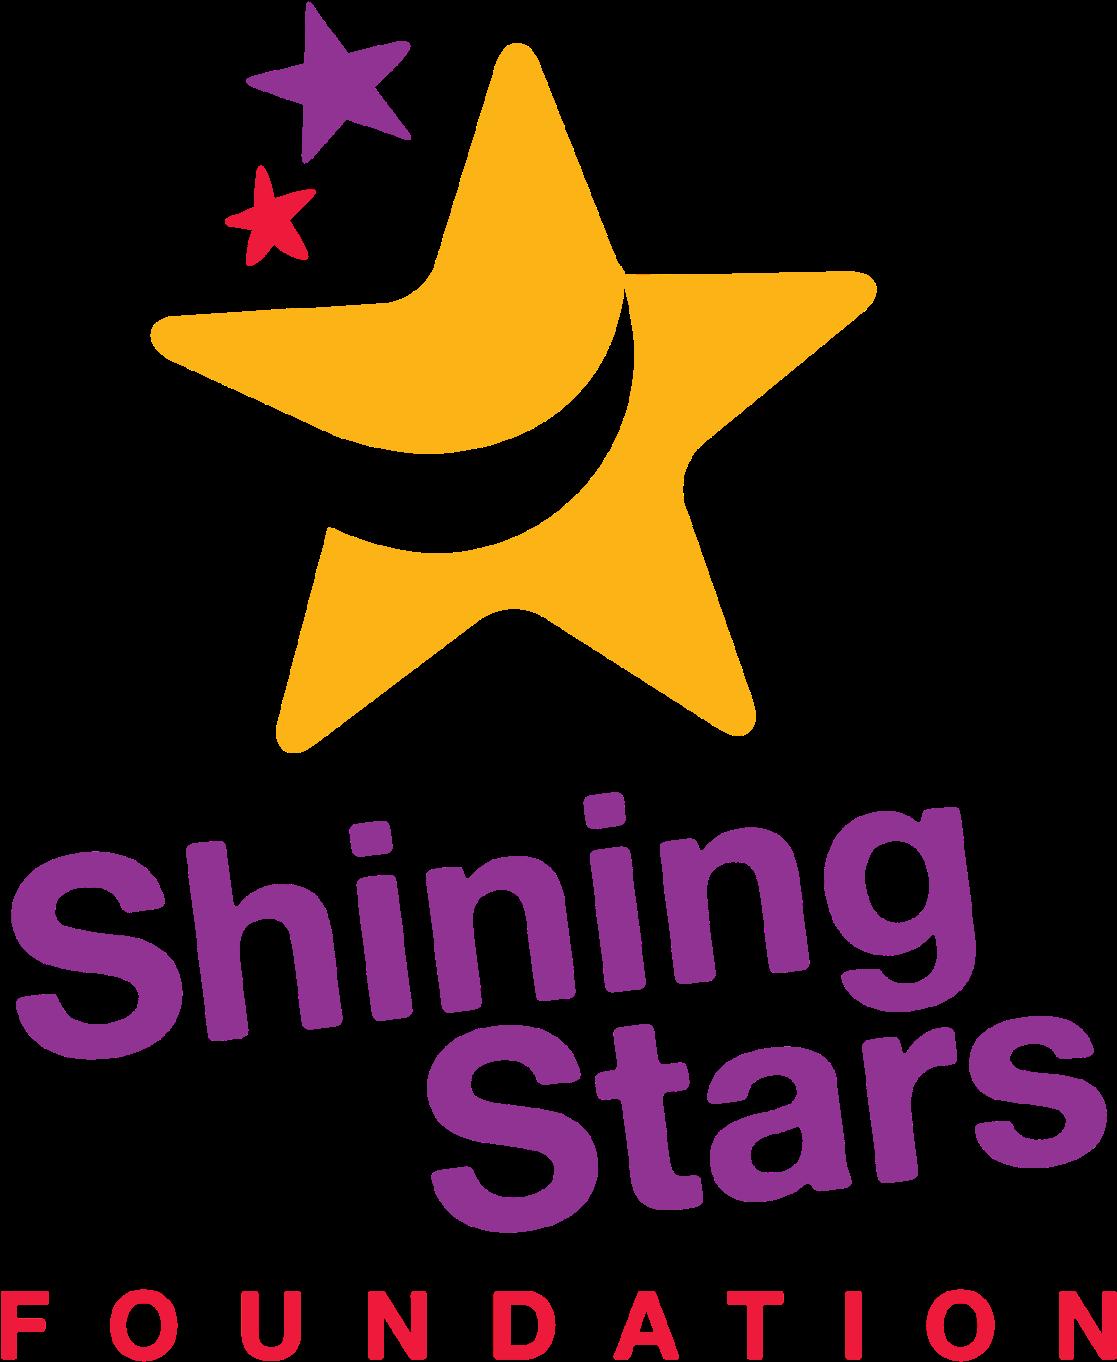 Transparent shining star clipart - Shiny Transparent Shining Star - Shining Stars Foundation Logo